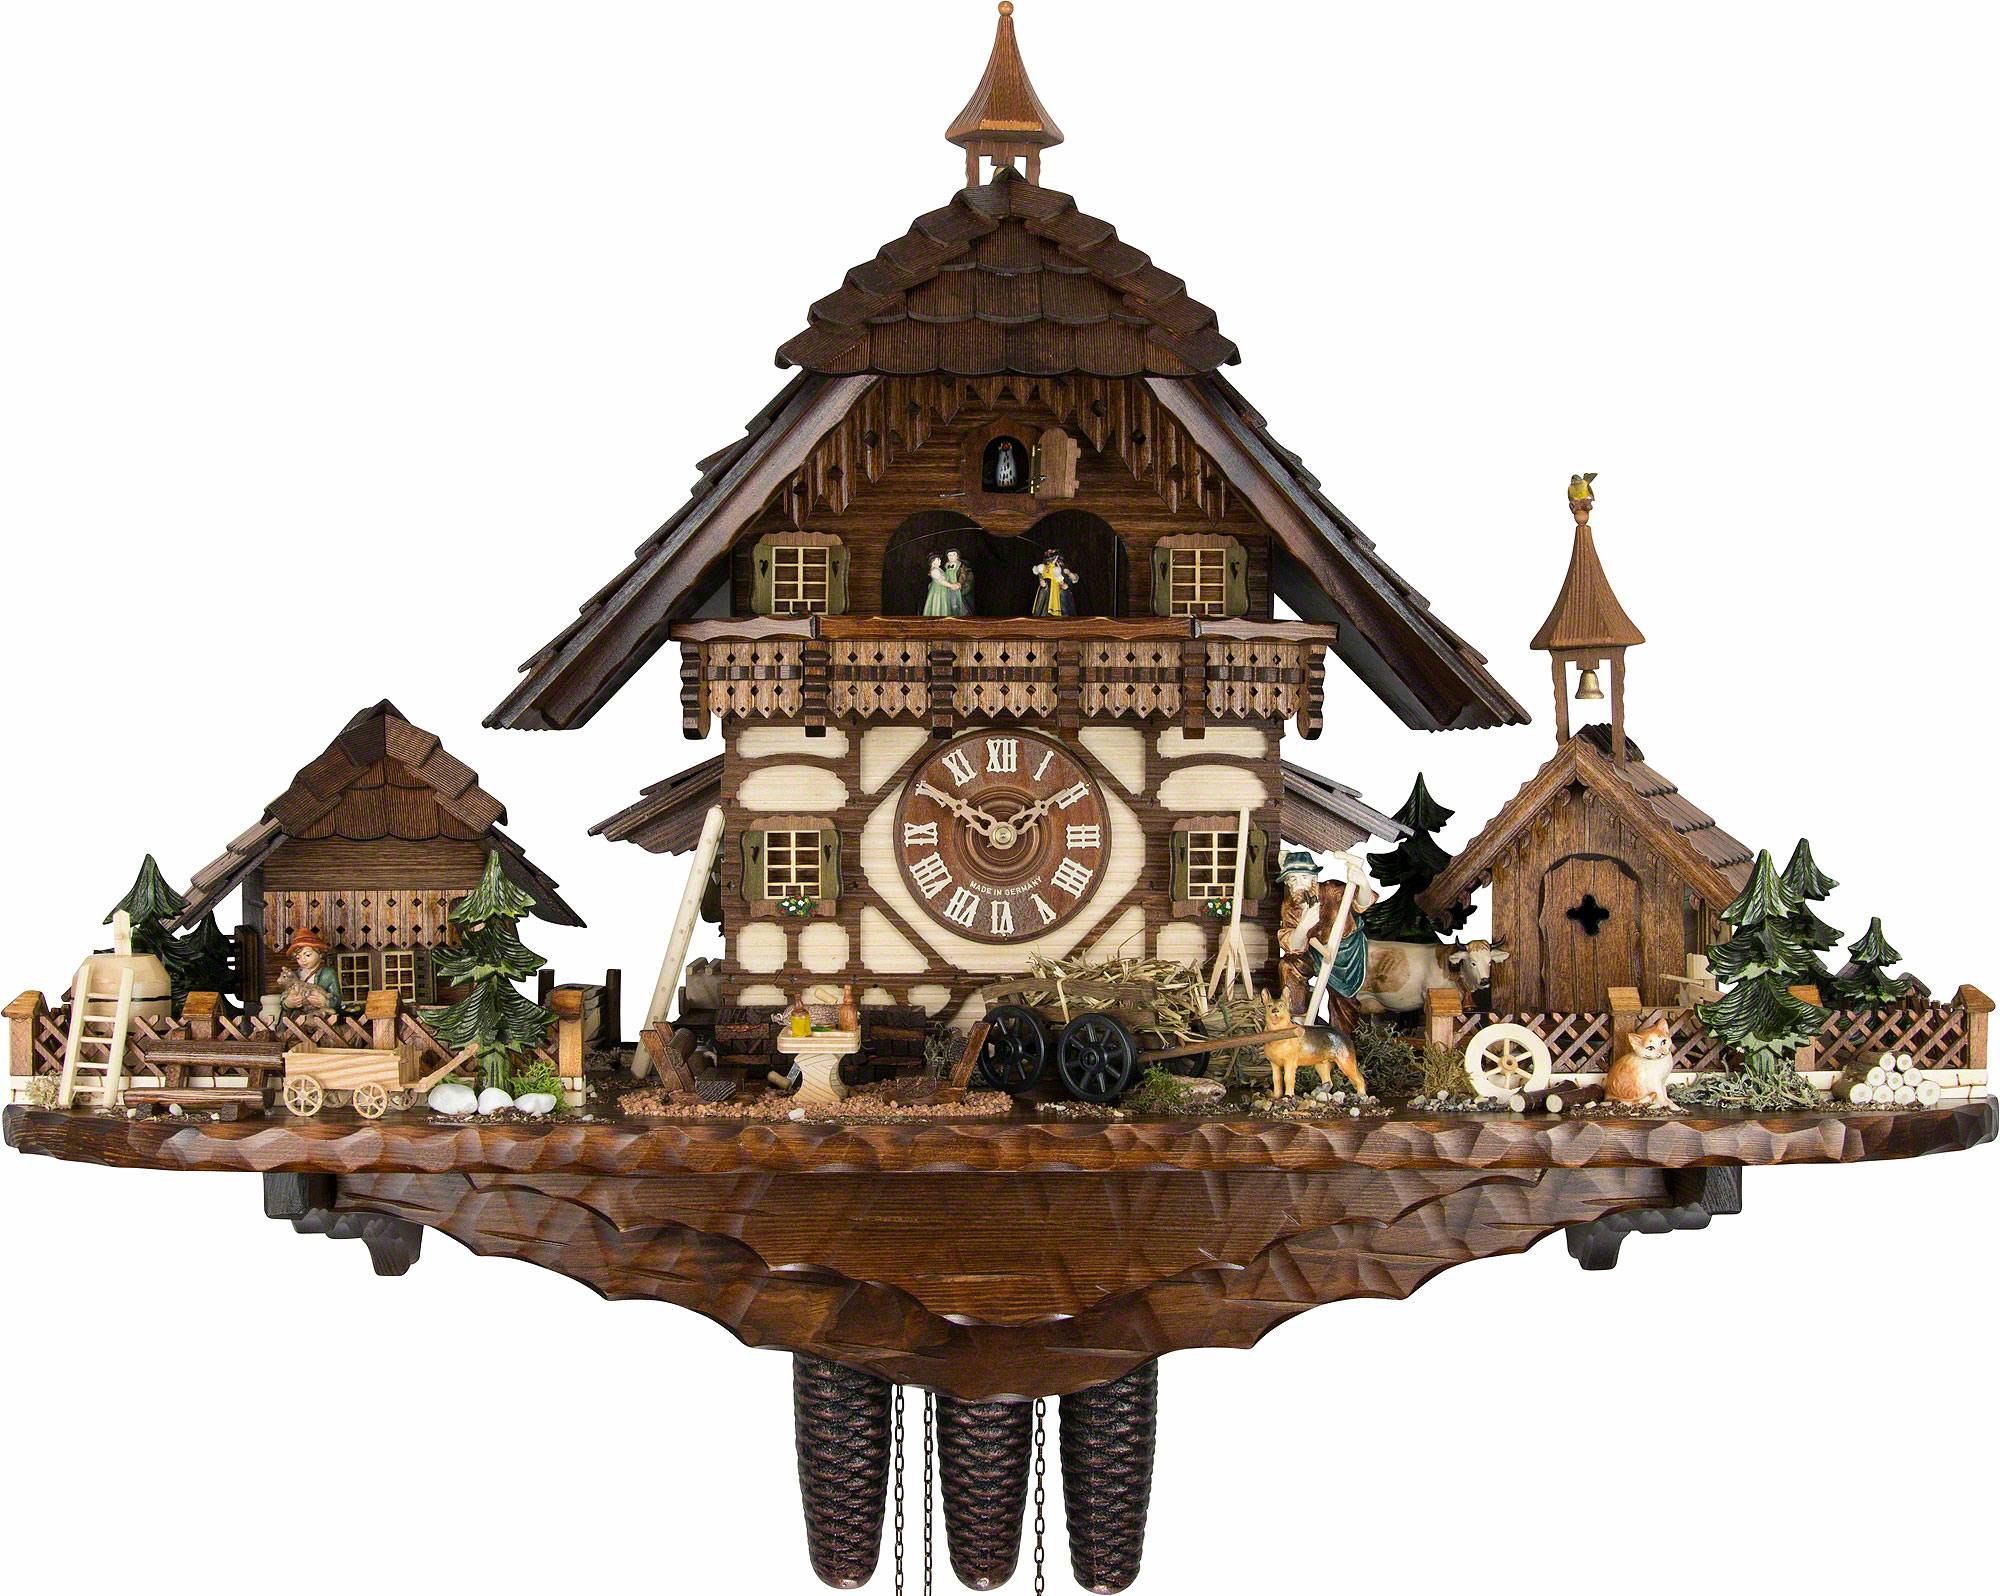 Cuckoo clocks history solidwood interiors decor handicrafts cuckoo clocks and its history amipublicfo Images